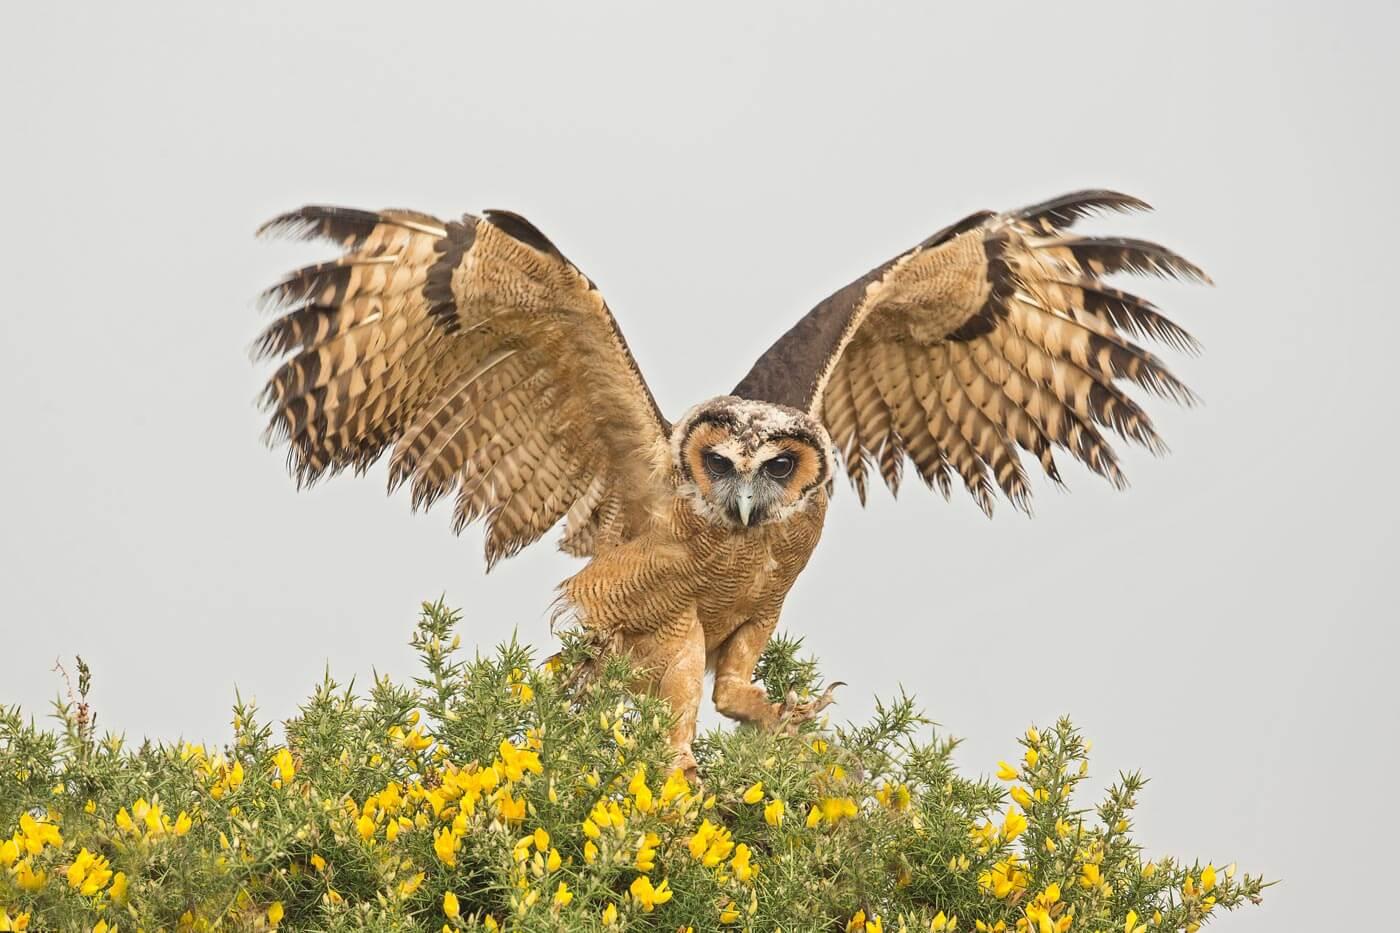 PWP_002_Brown_Owl__H0R5360A